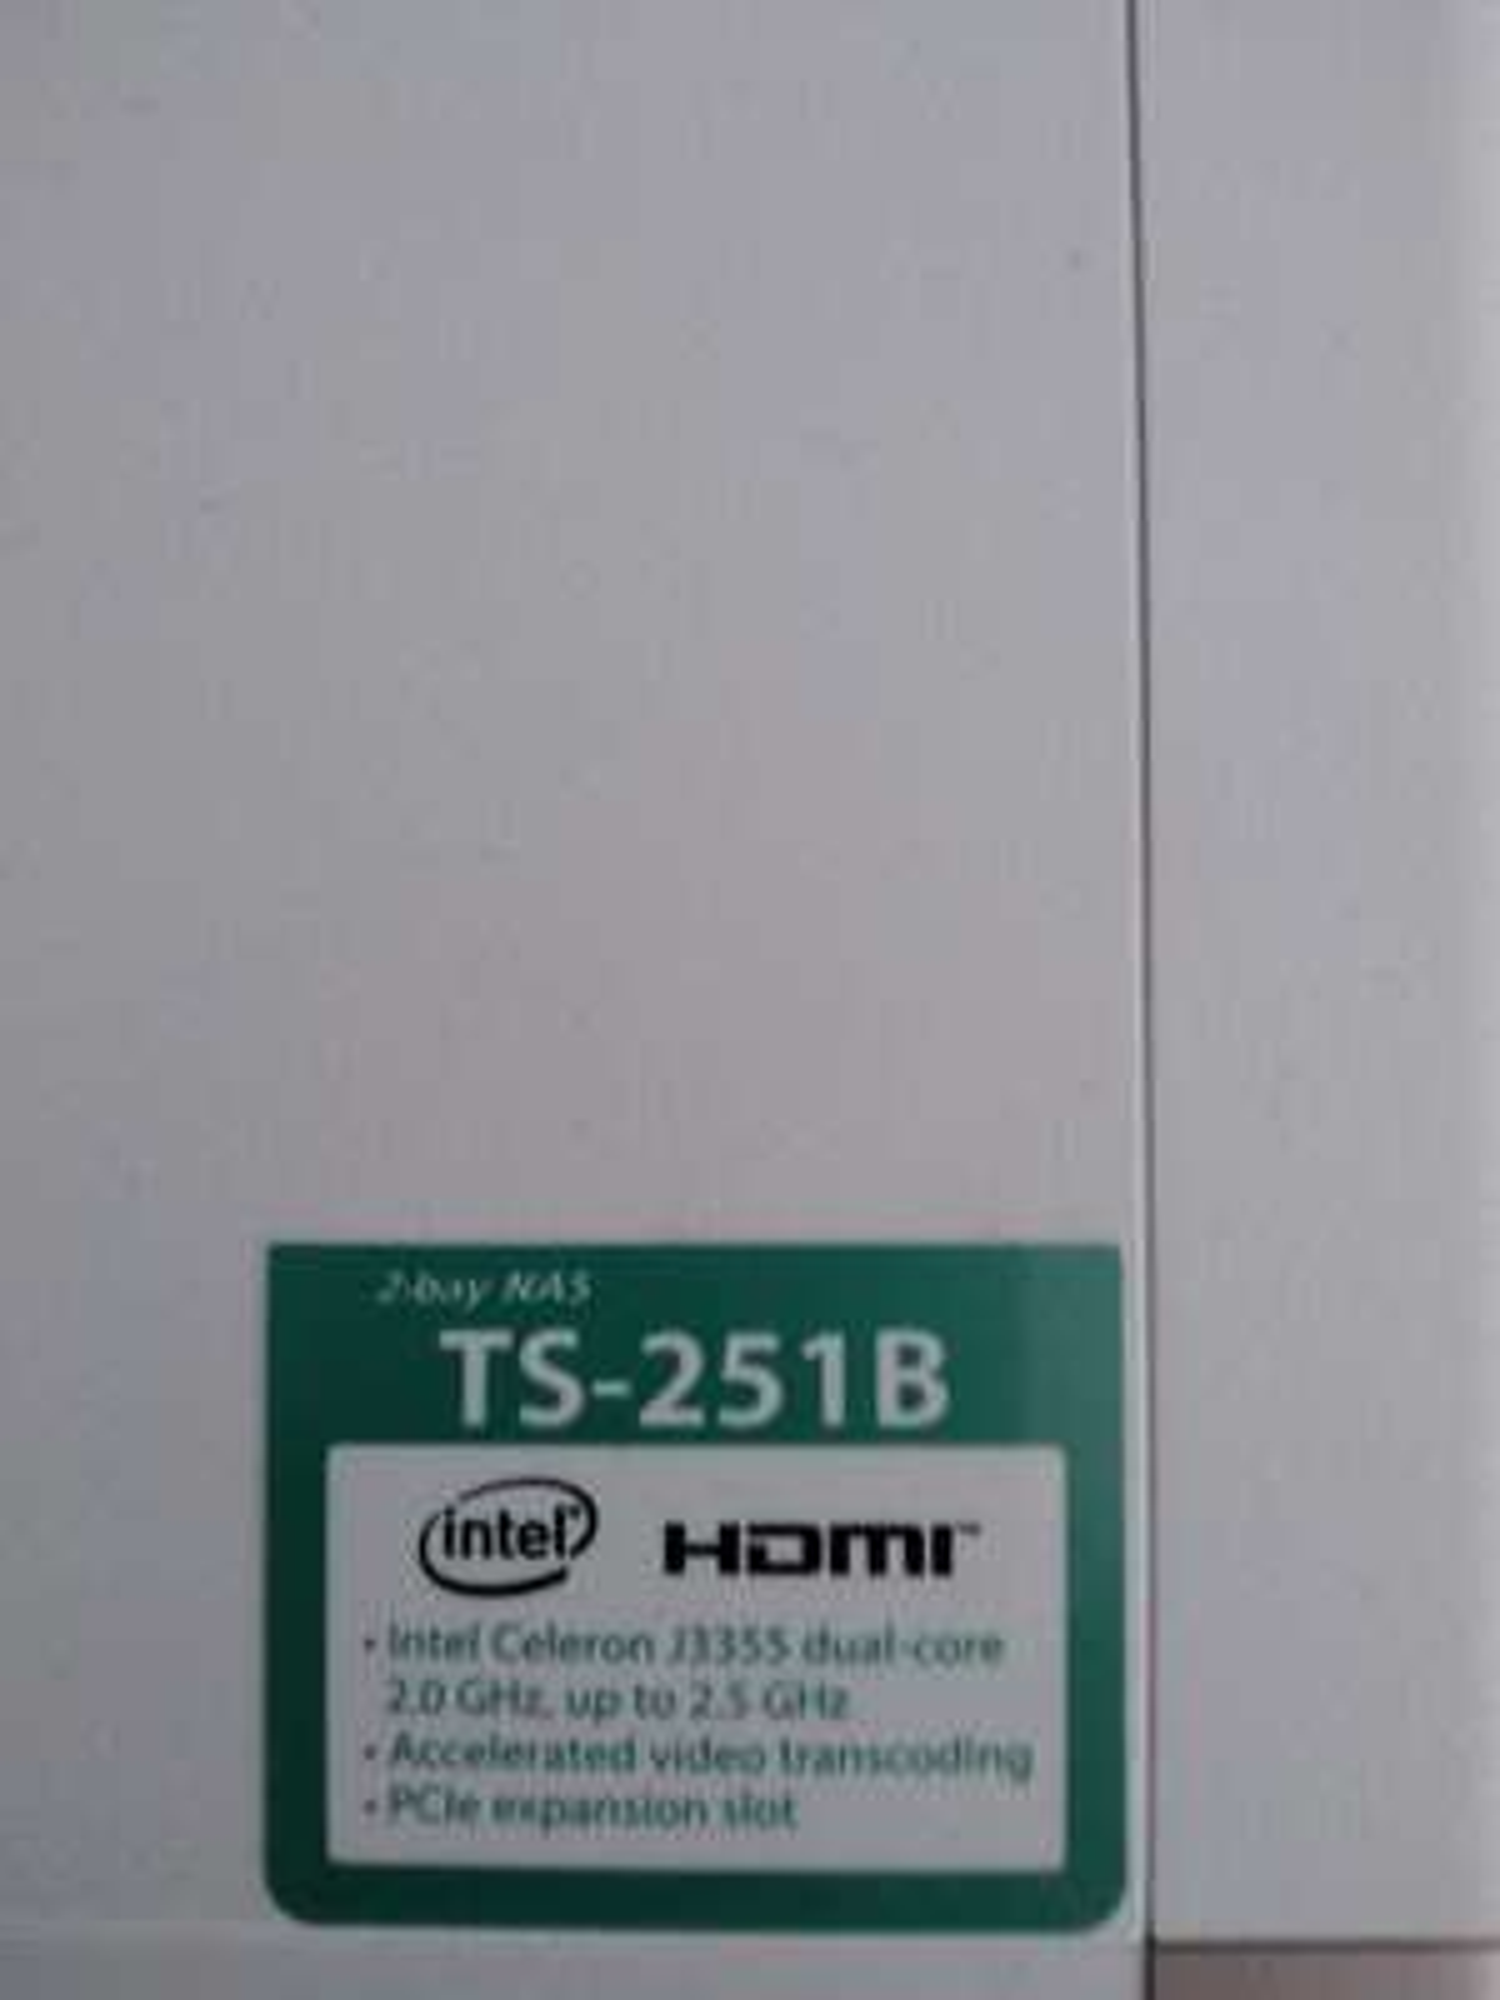 QNAP TS-251B-4G NAS System 2-Bay